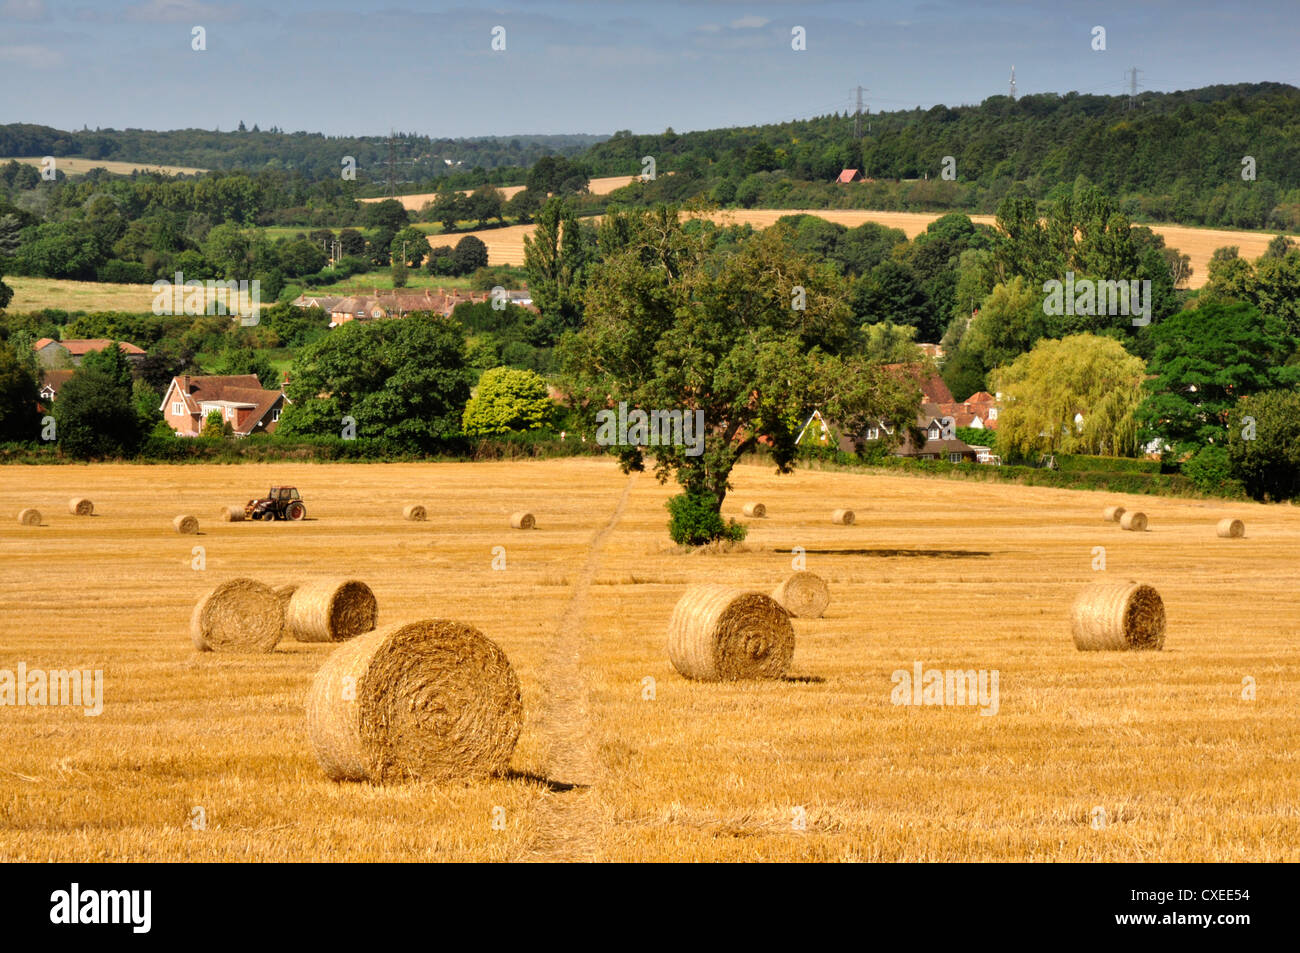 Chiltern Hills - Buckinghamshire - harvested field - golden stubble and straw bales autumn sunlight - Little Missenden - Stock Image